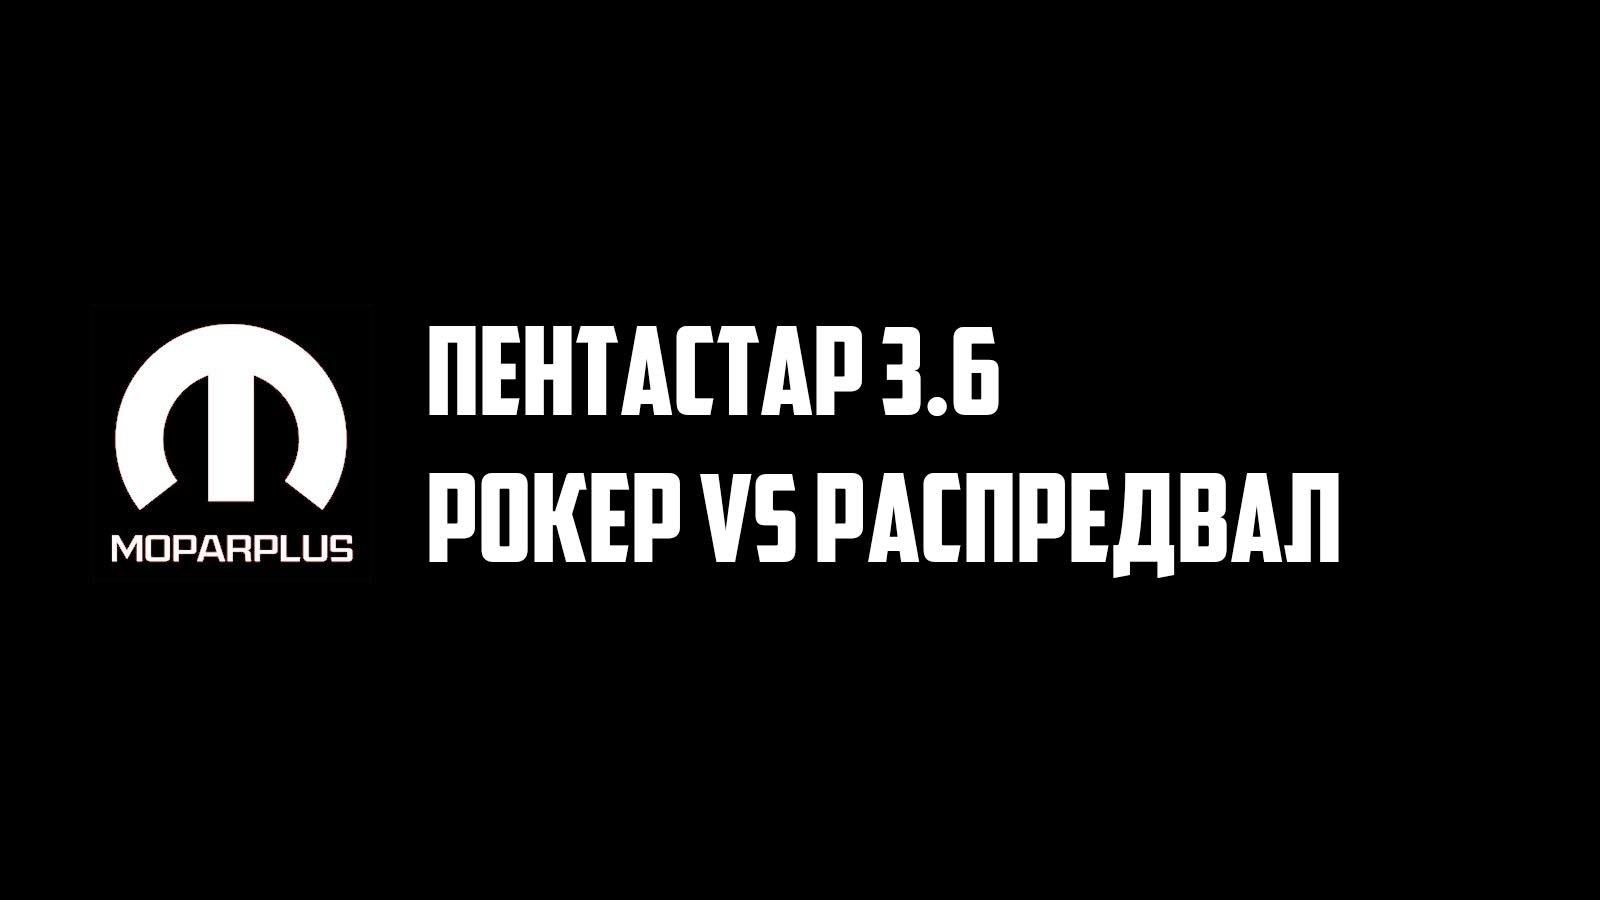 Пентастар 3.6: рокер vs распредвал